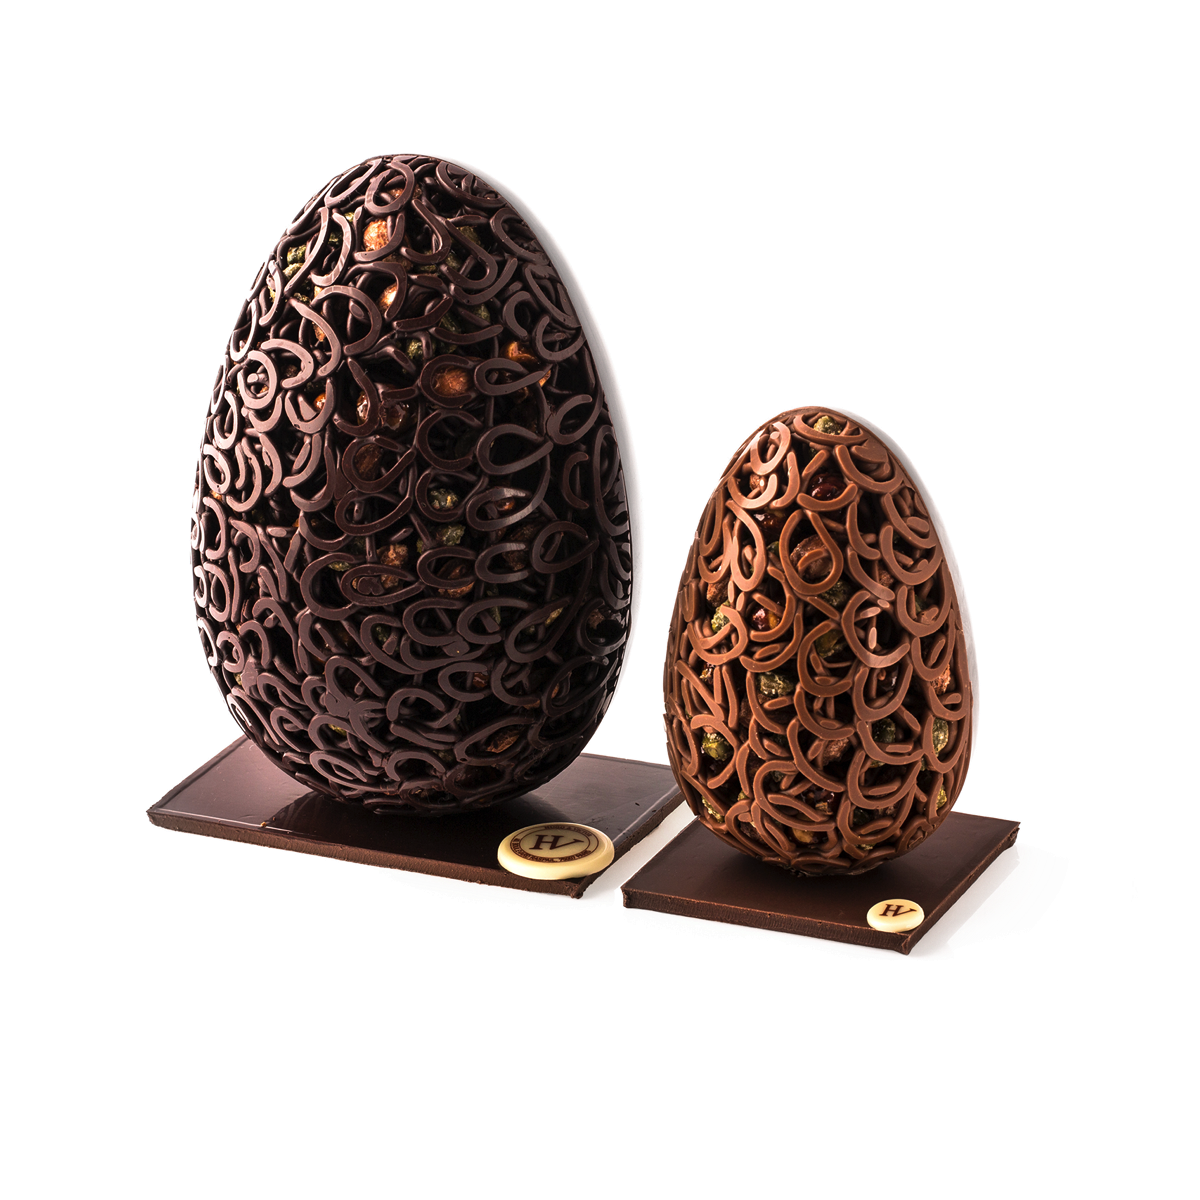 Oeuf dentelle chocolat noir